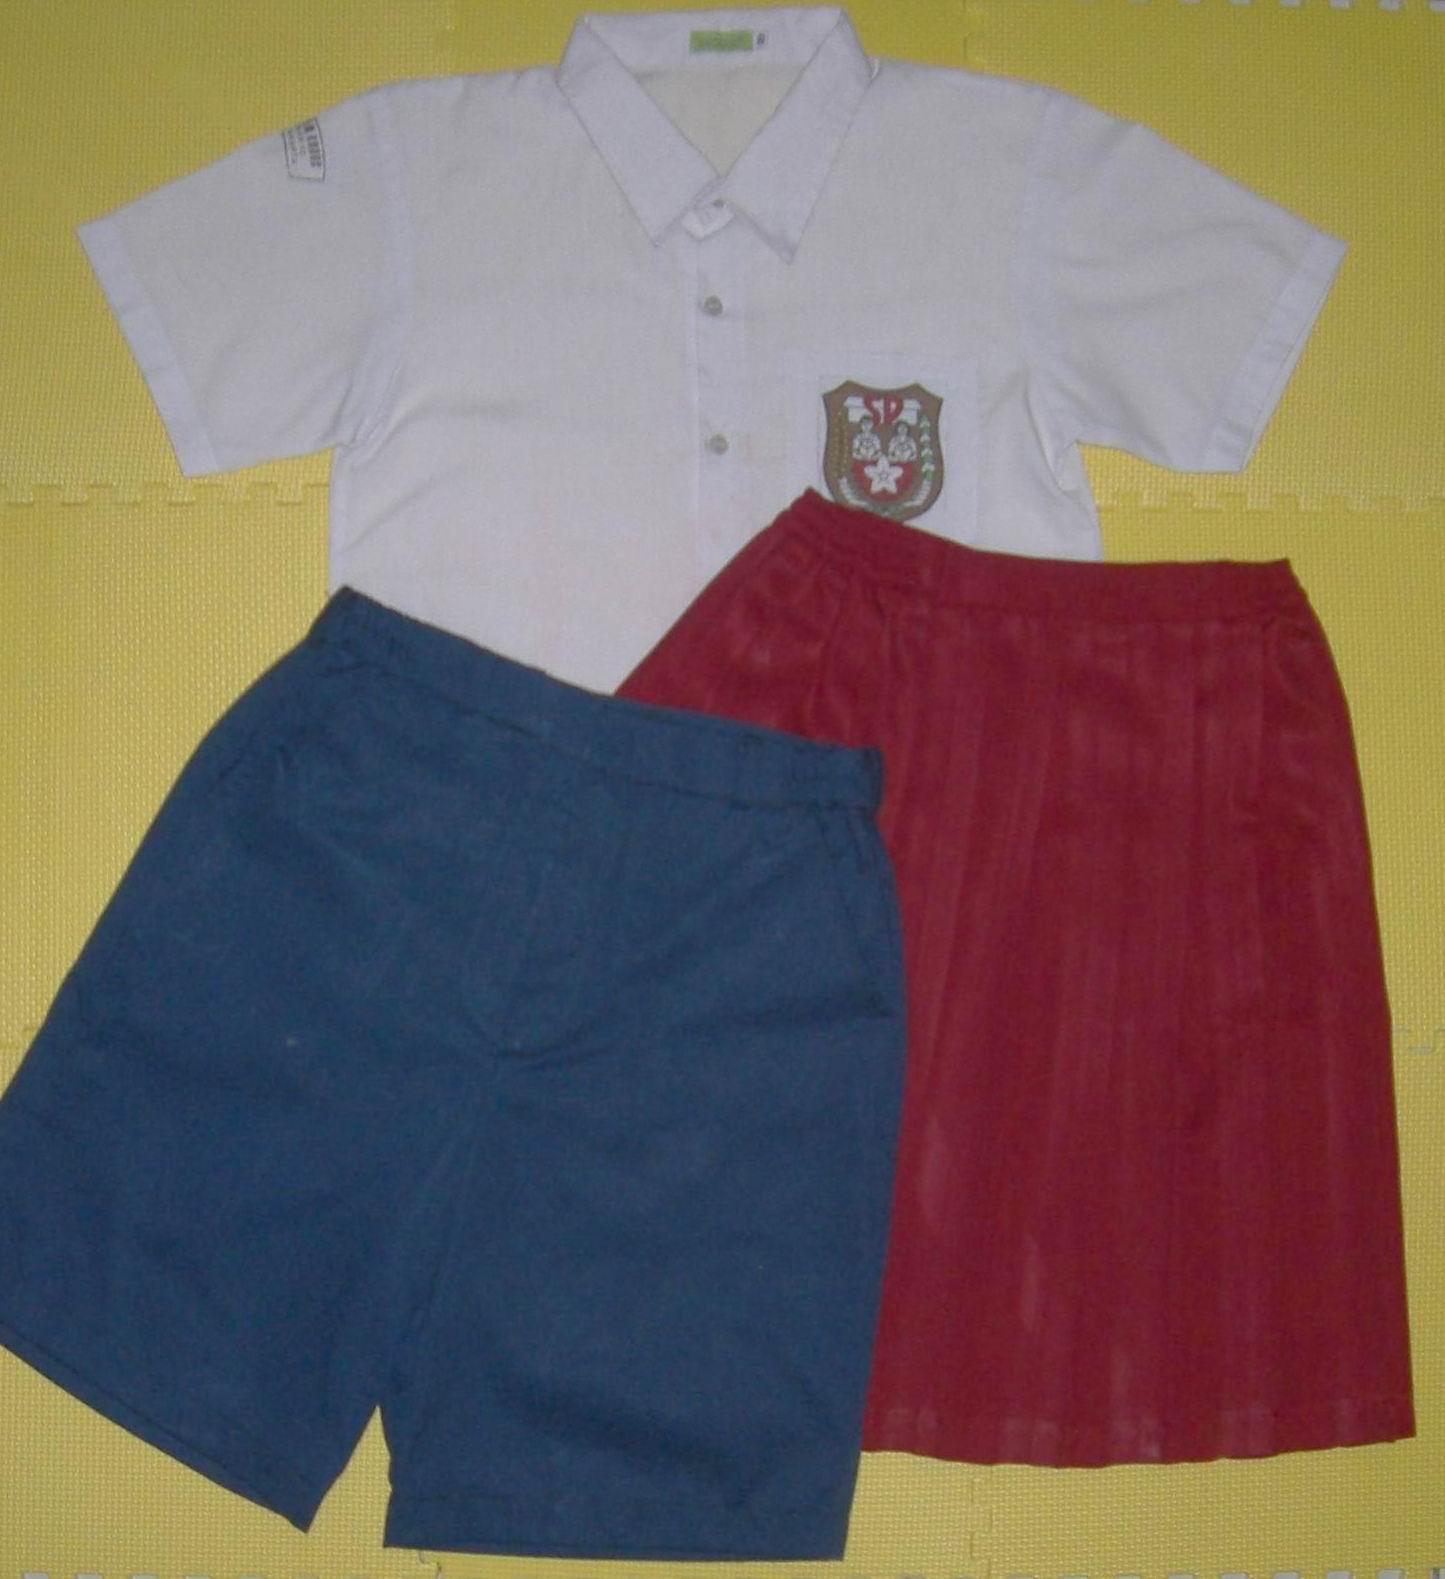 OKKY BUSANA DESIGN PRODUCTION baju seragam okky design